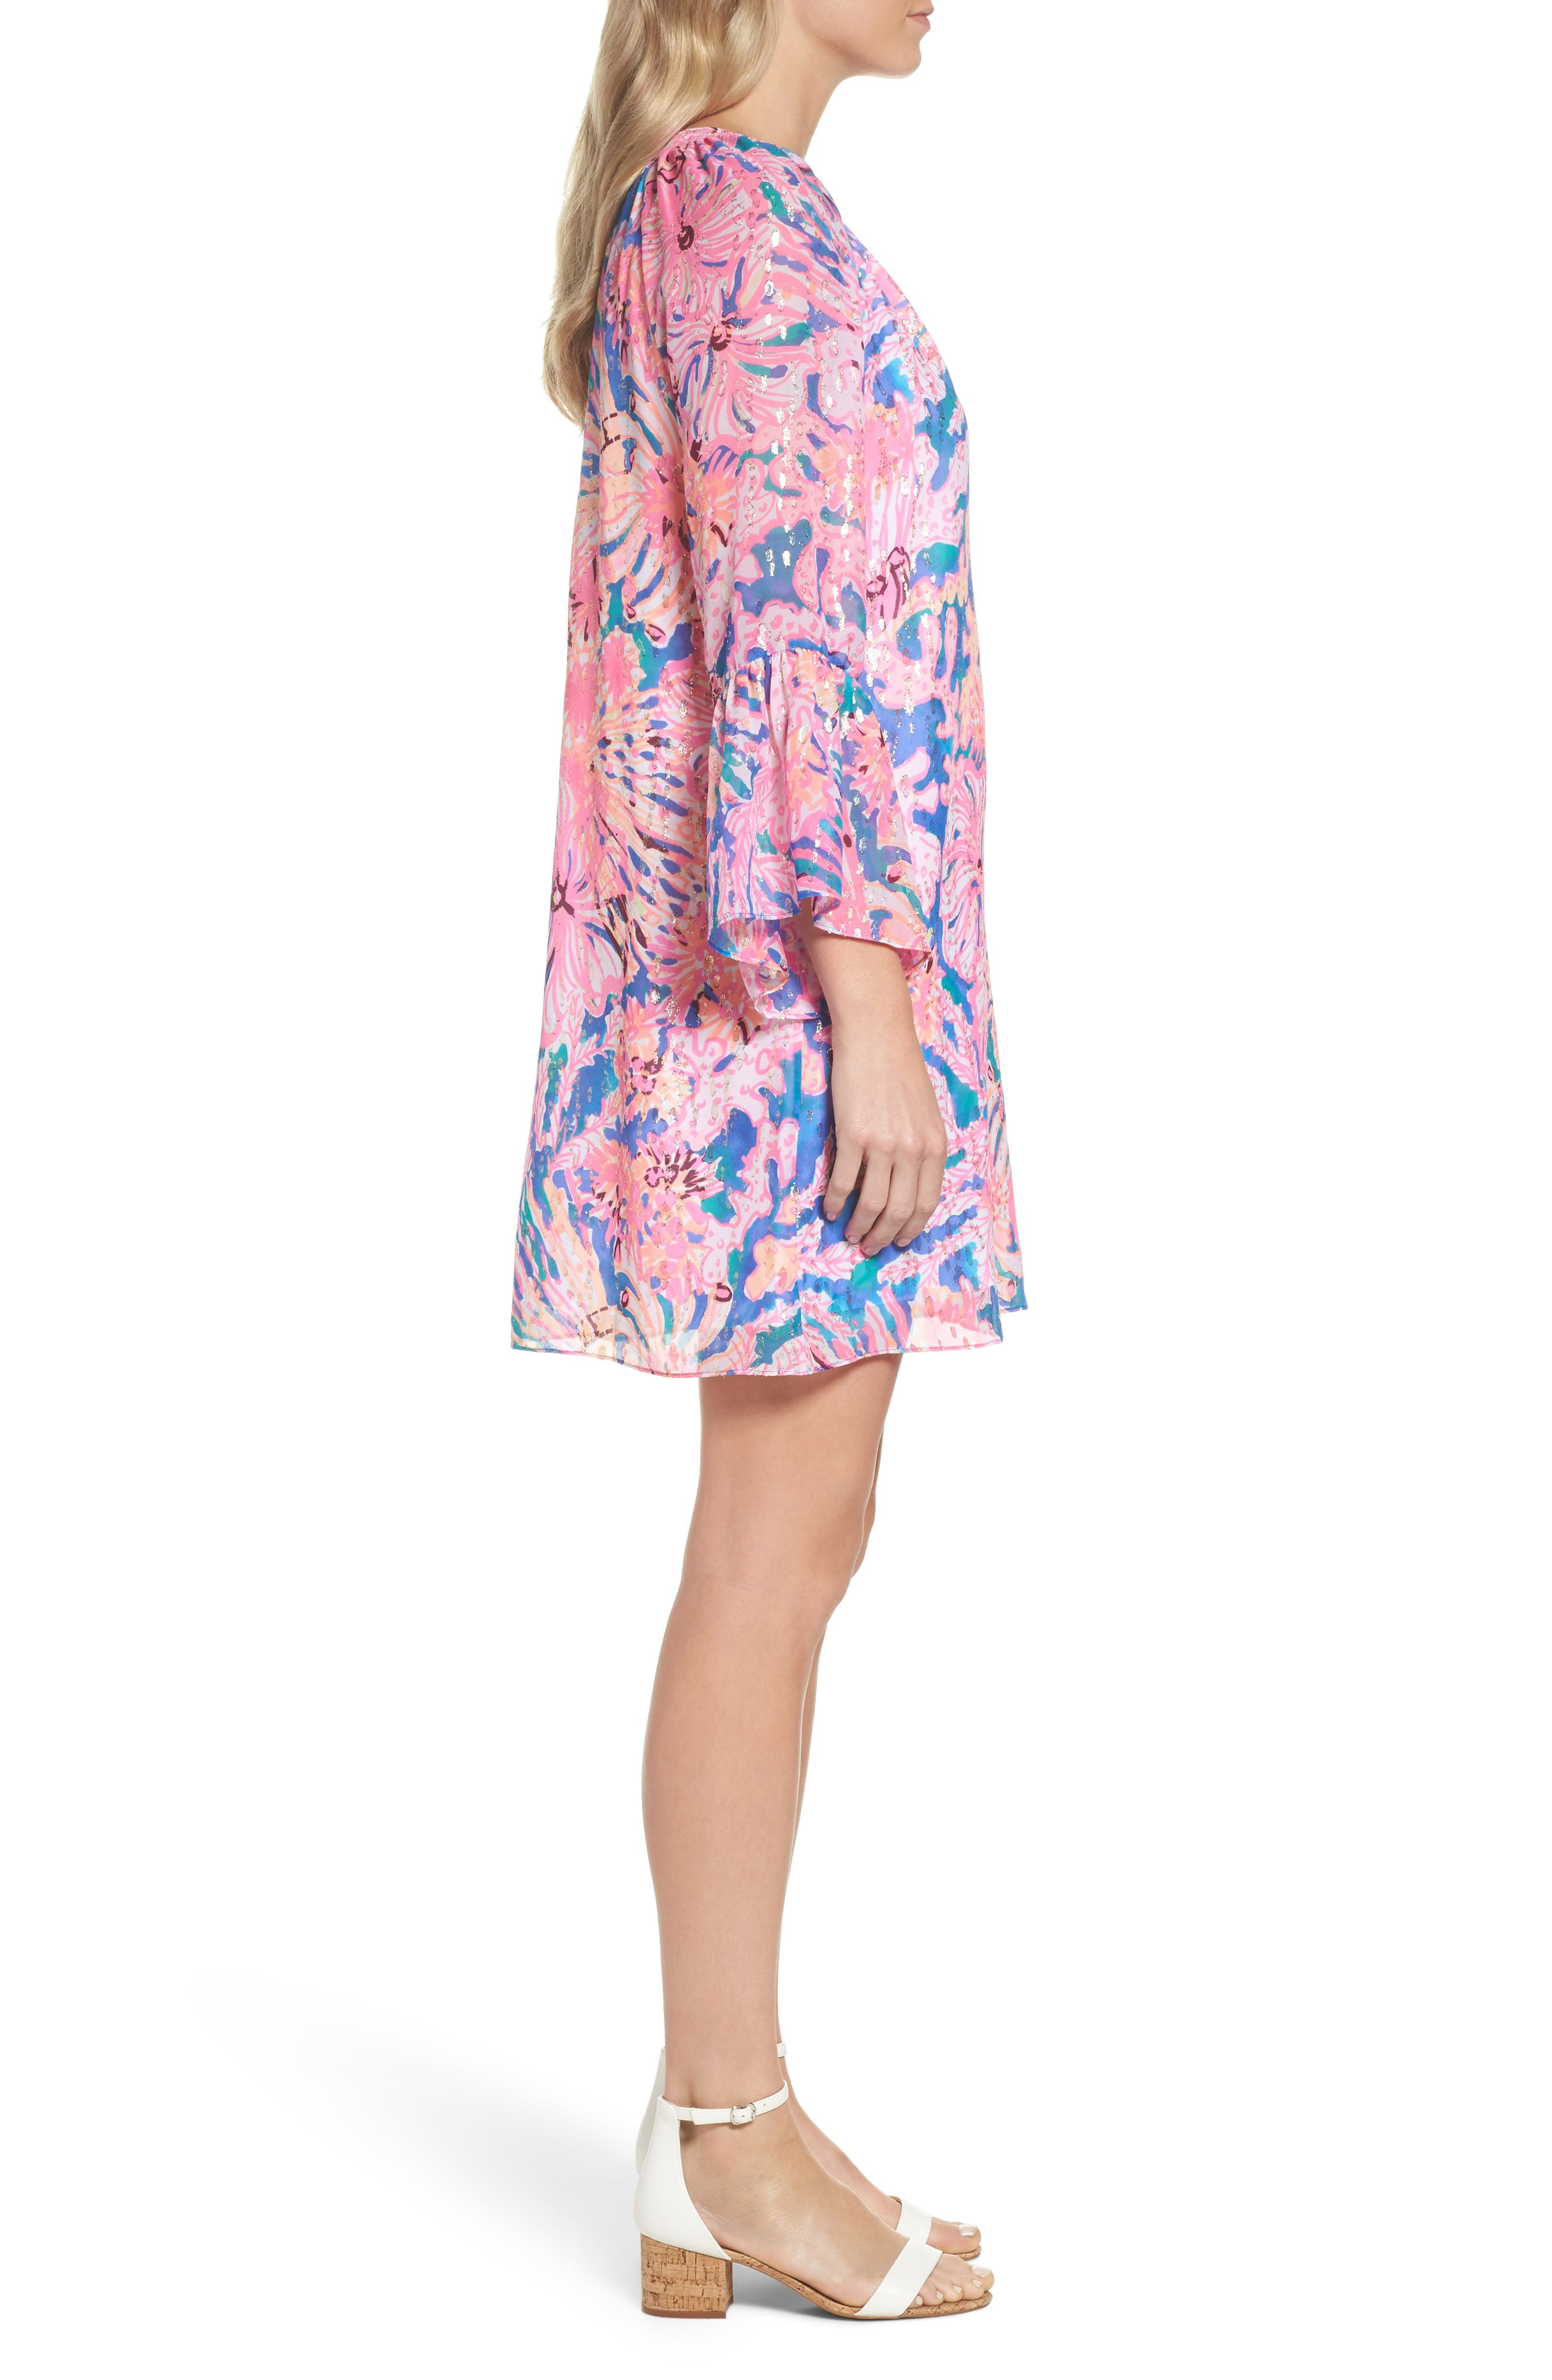 Matilda Tunic Dress,                             Alternate thumbnail 3, color,                             Multi Swirling Seadream